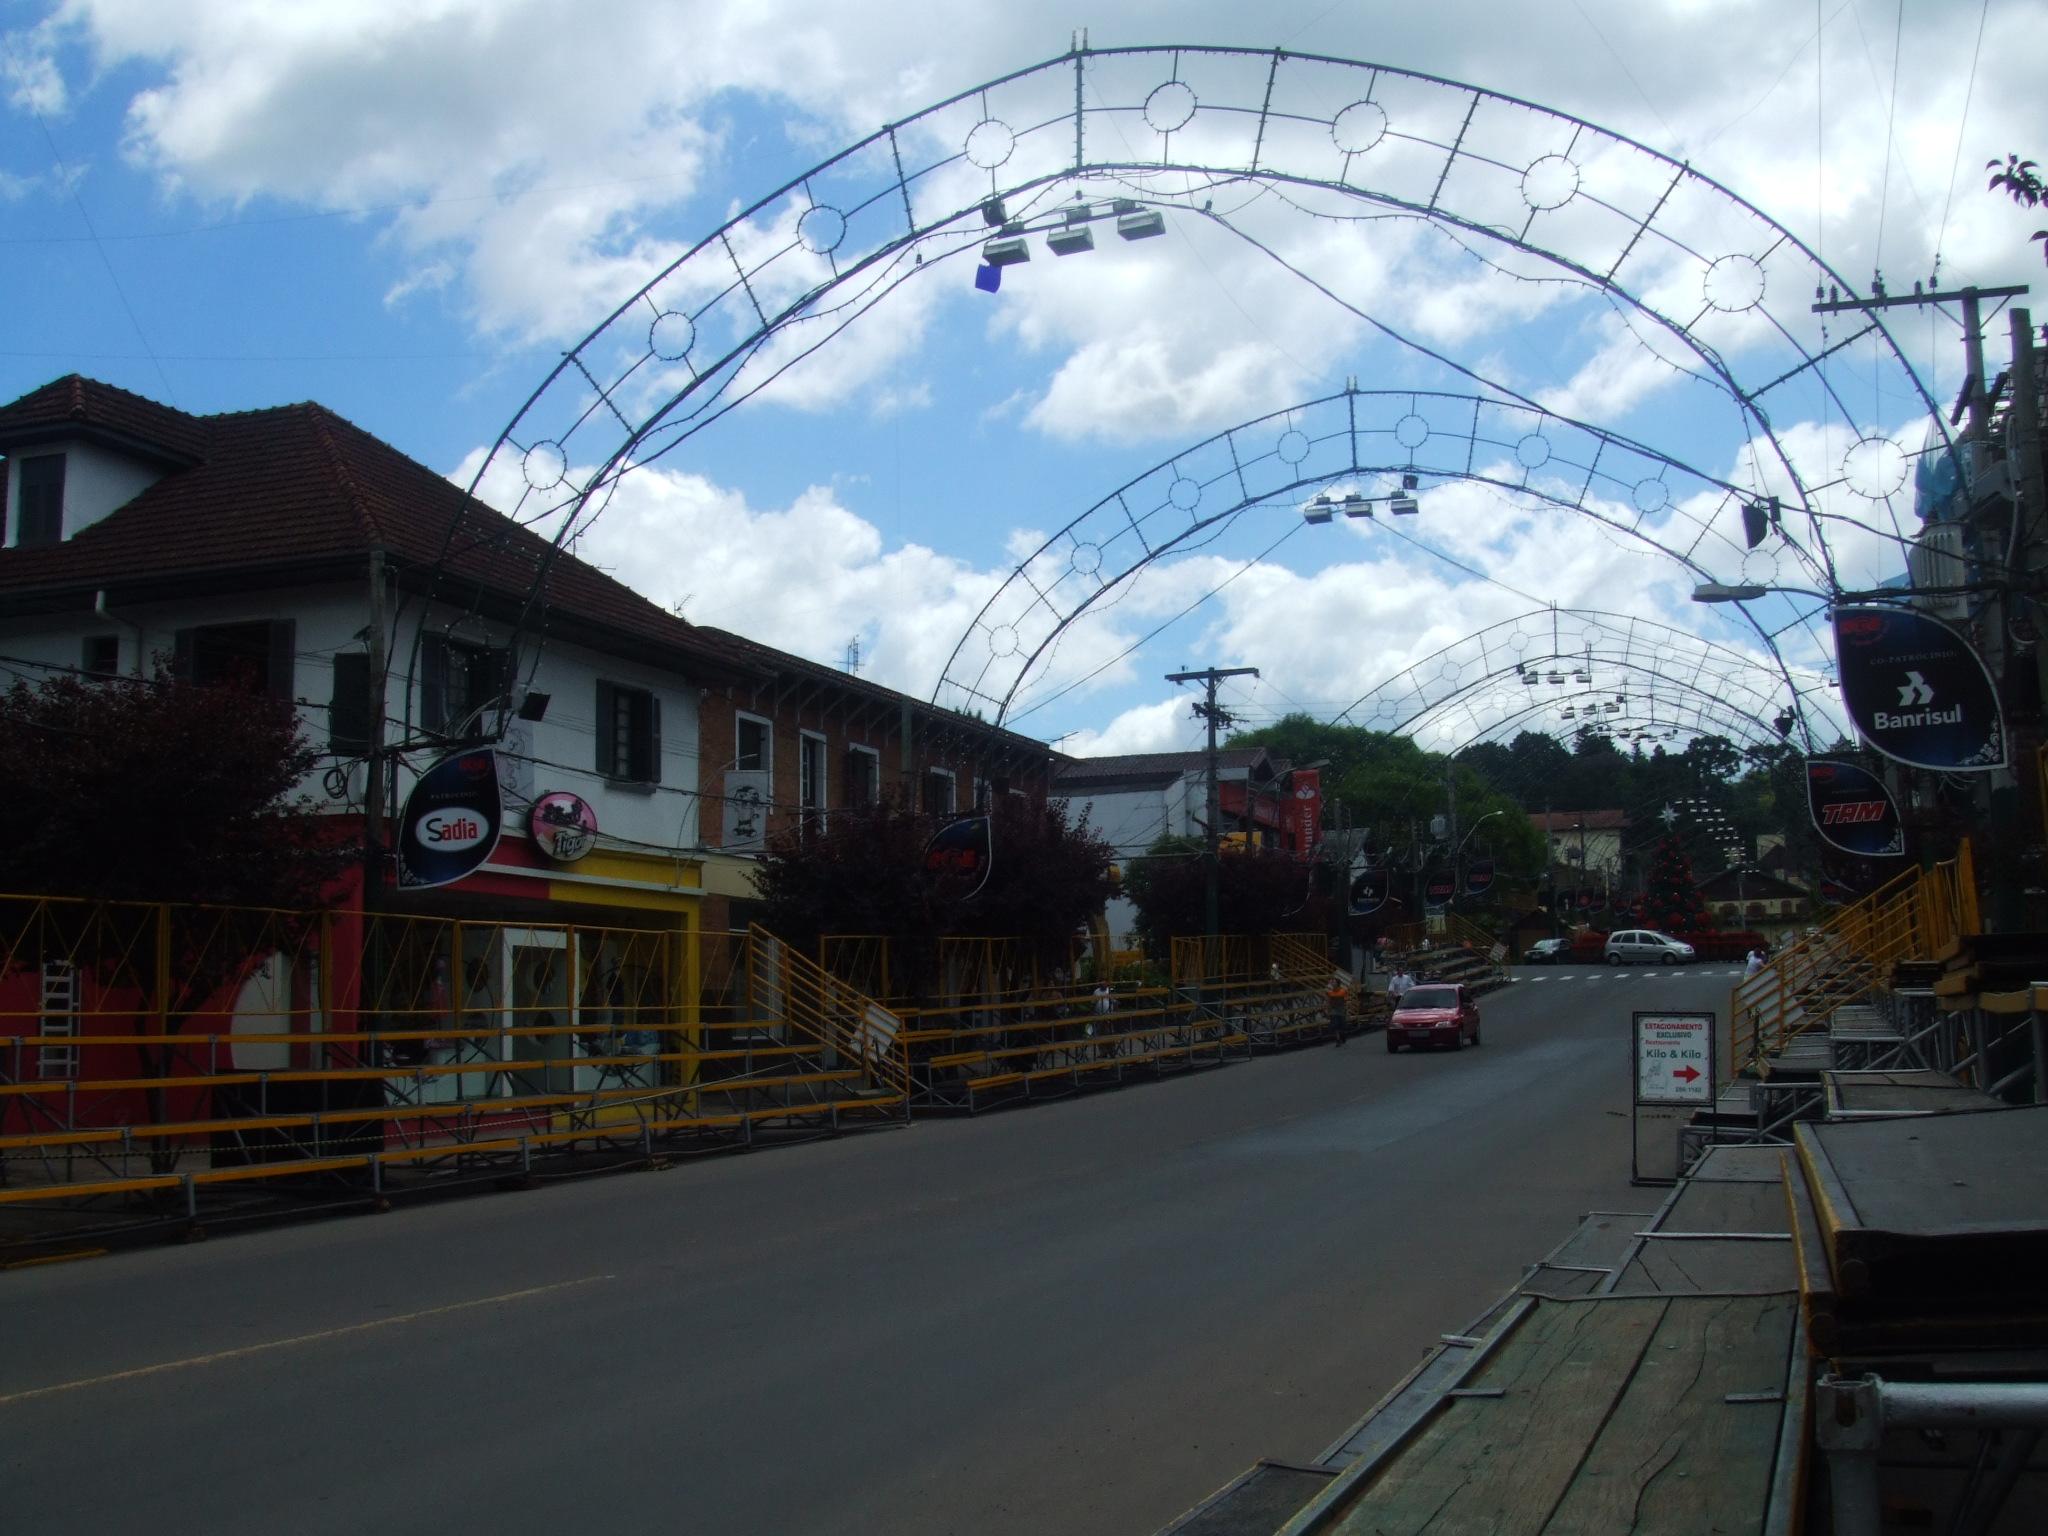 Gramadoの街並み